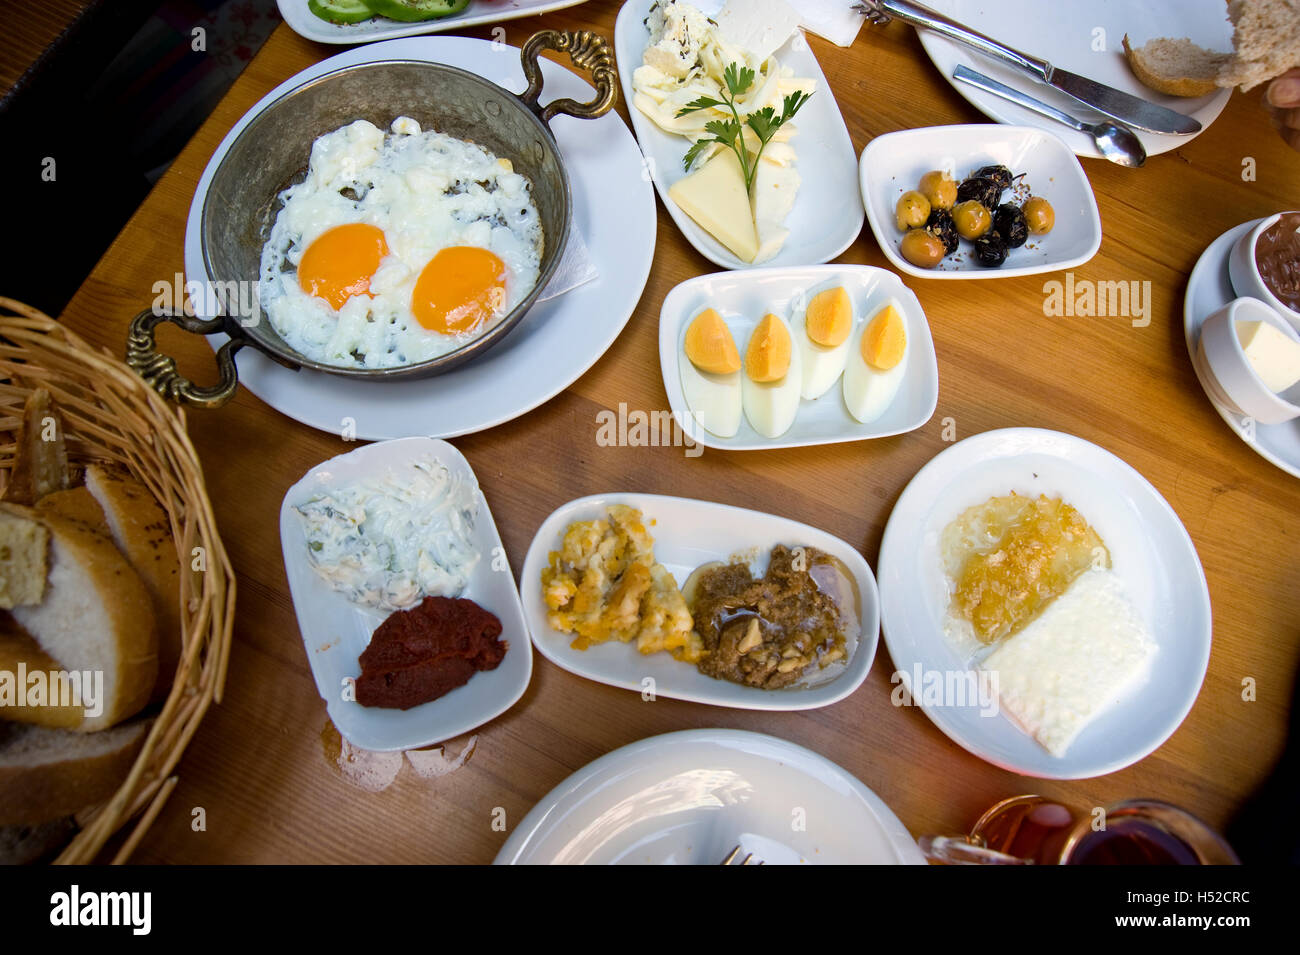 Speisen zum Frühstück im Restaurant in Istanbul, Türkei Stockbild